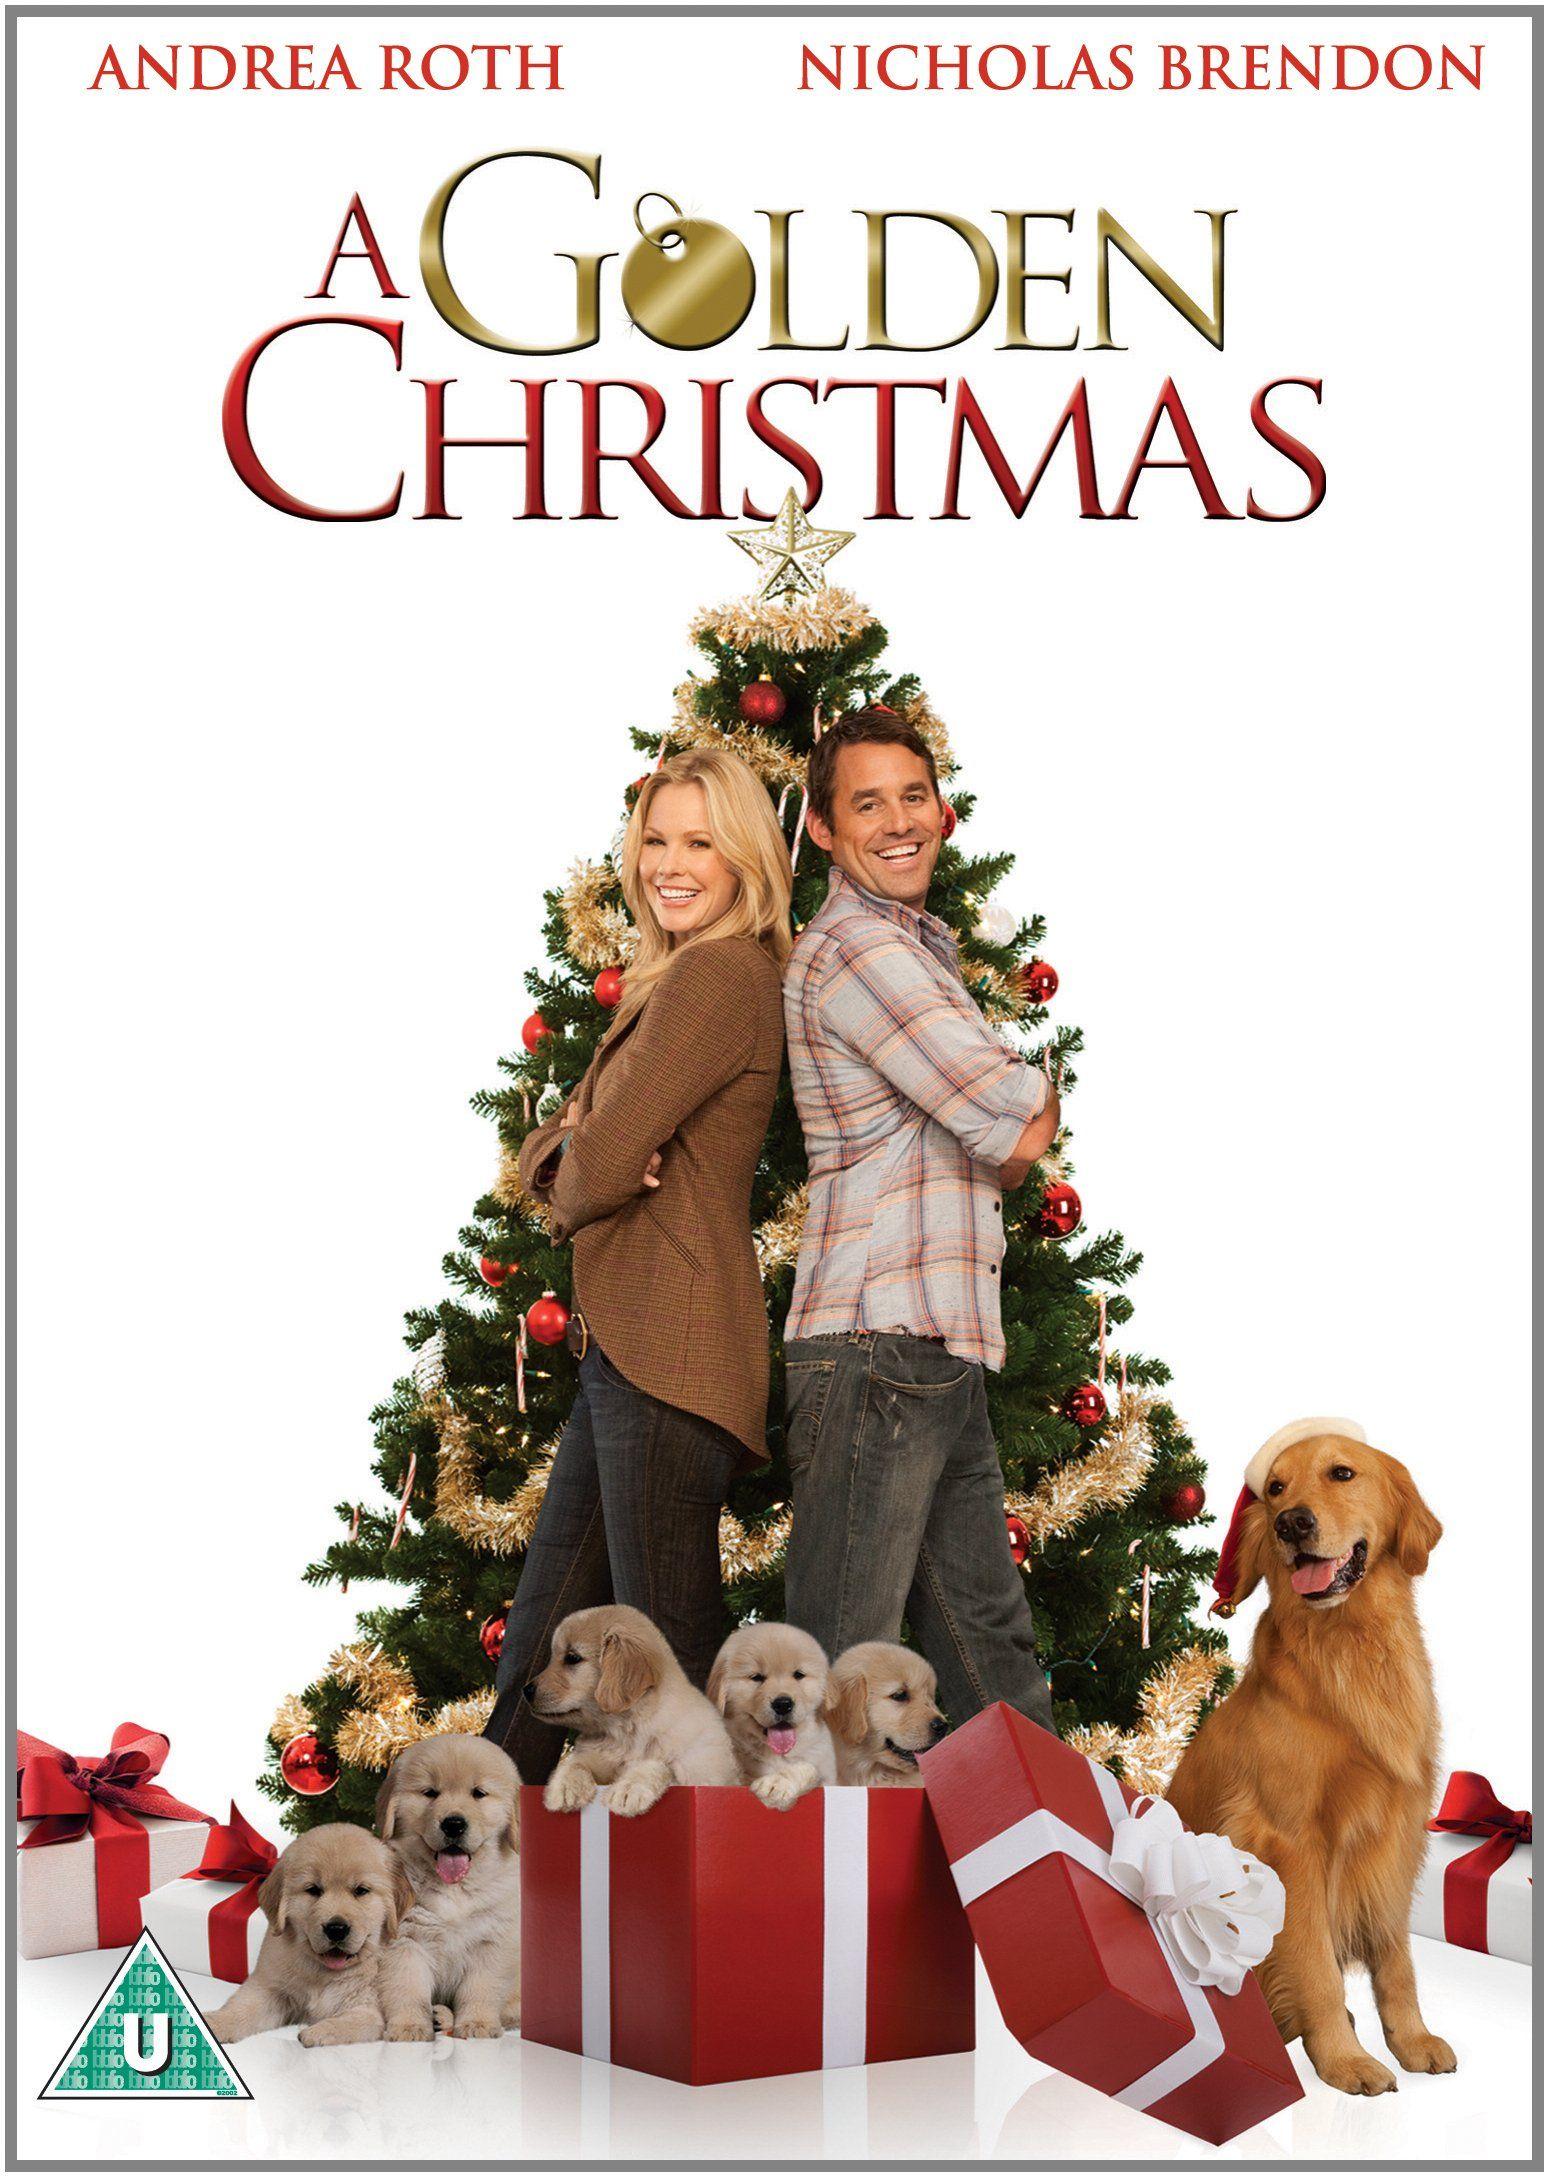 A Golden Christmas Dvd Amazon Co Uk Andrea Roth Nicholas Brendon Elisa Donovan Bruce Davison Alley Mills Christmas Movies Christmas Dvd Hallmark Movies